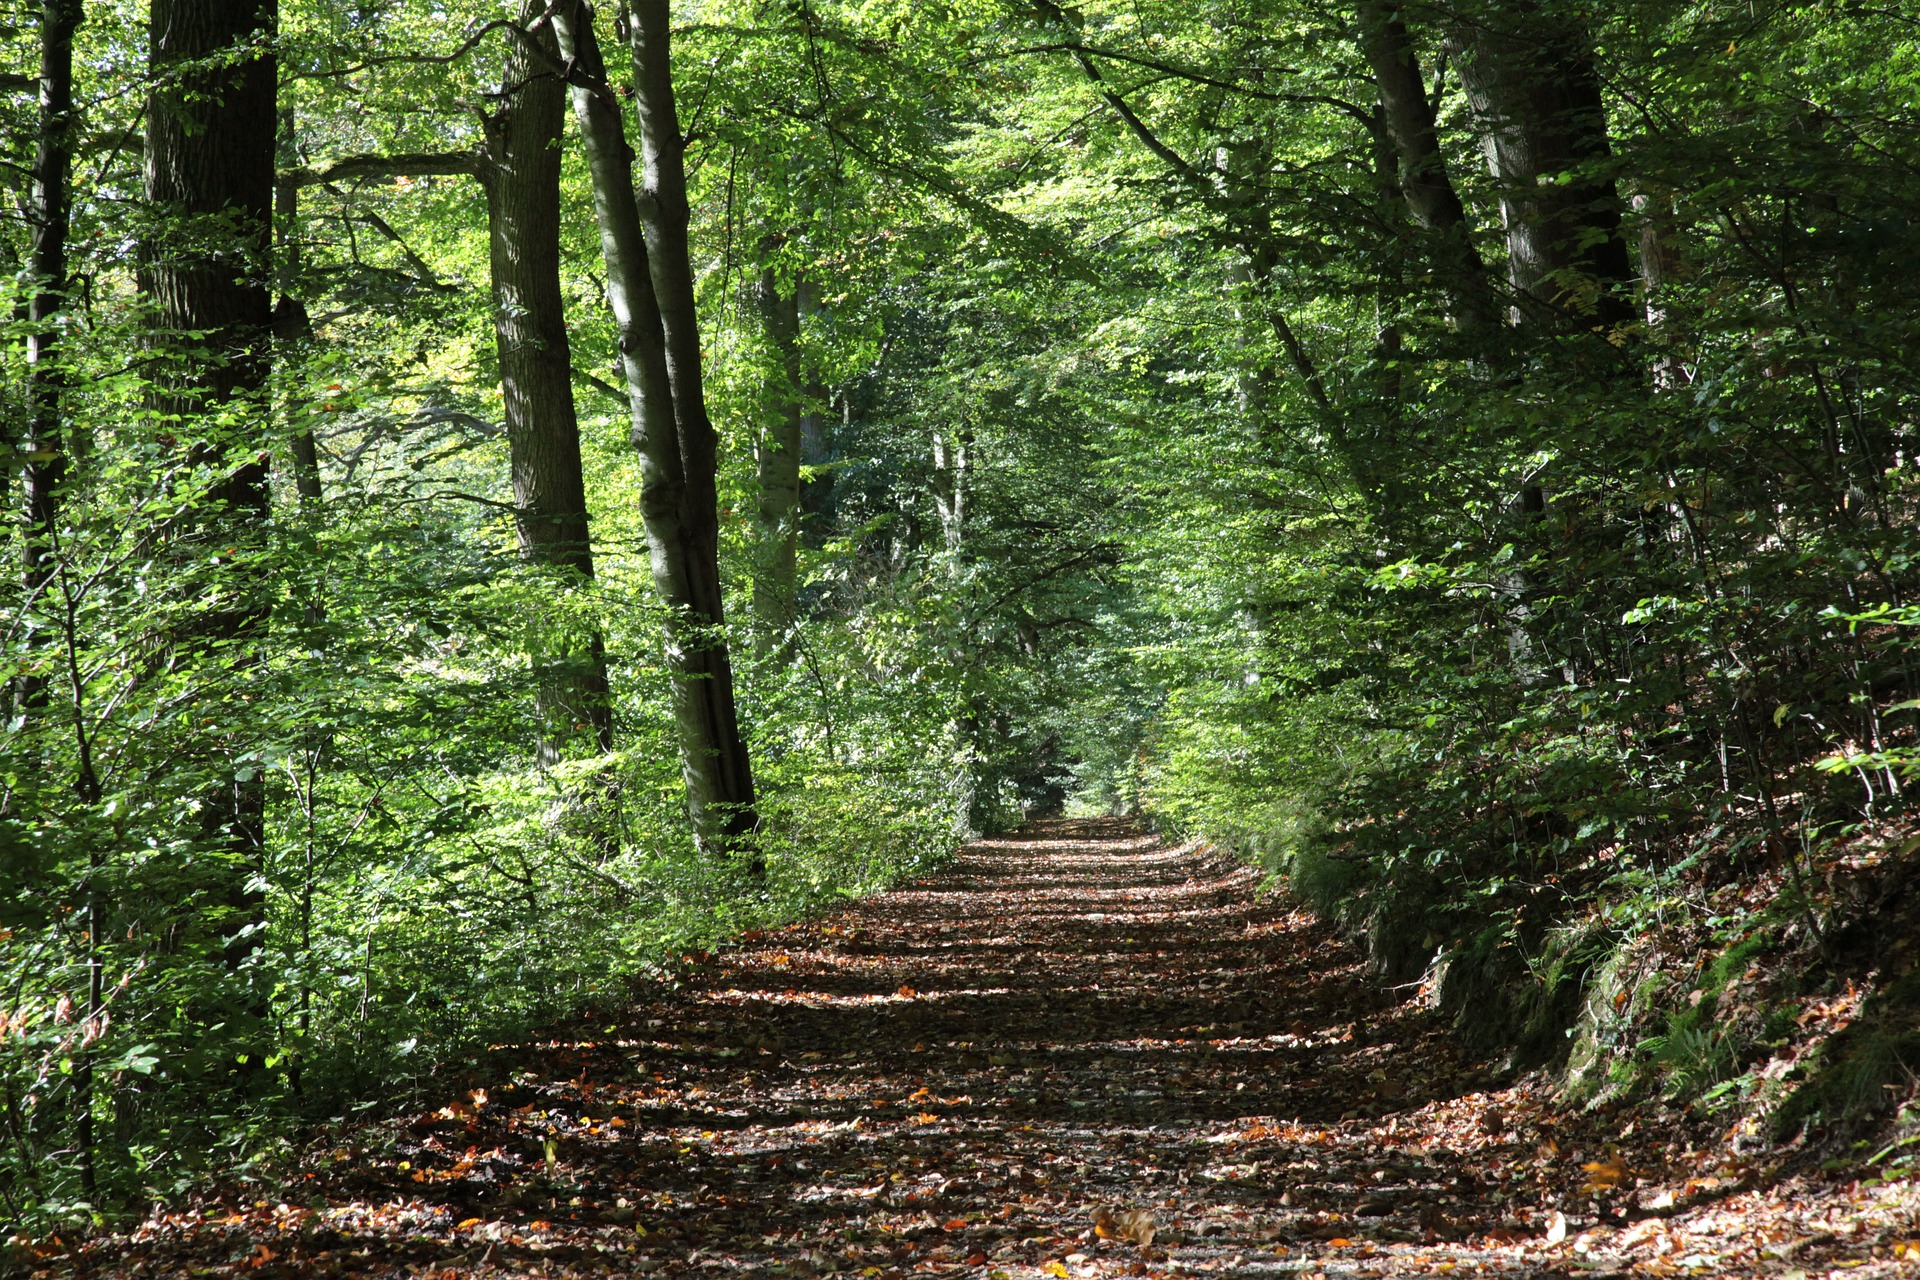 forest-path-pixabay2808216_1920.jpg